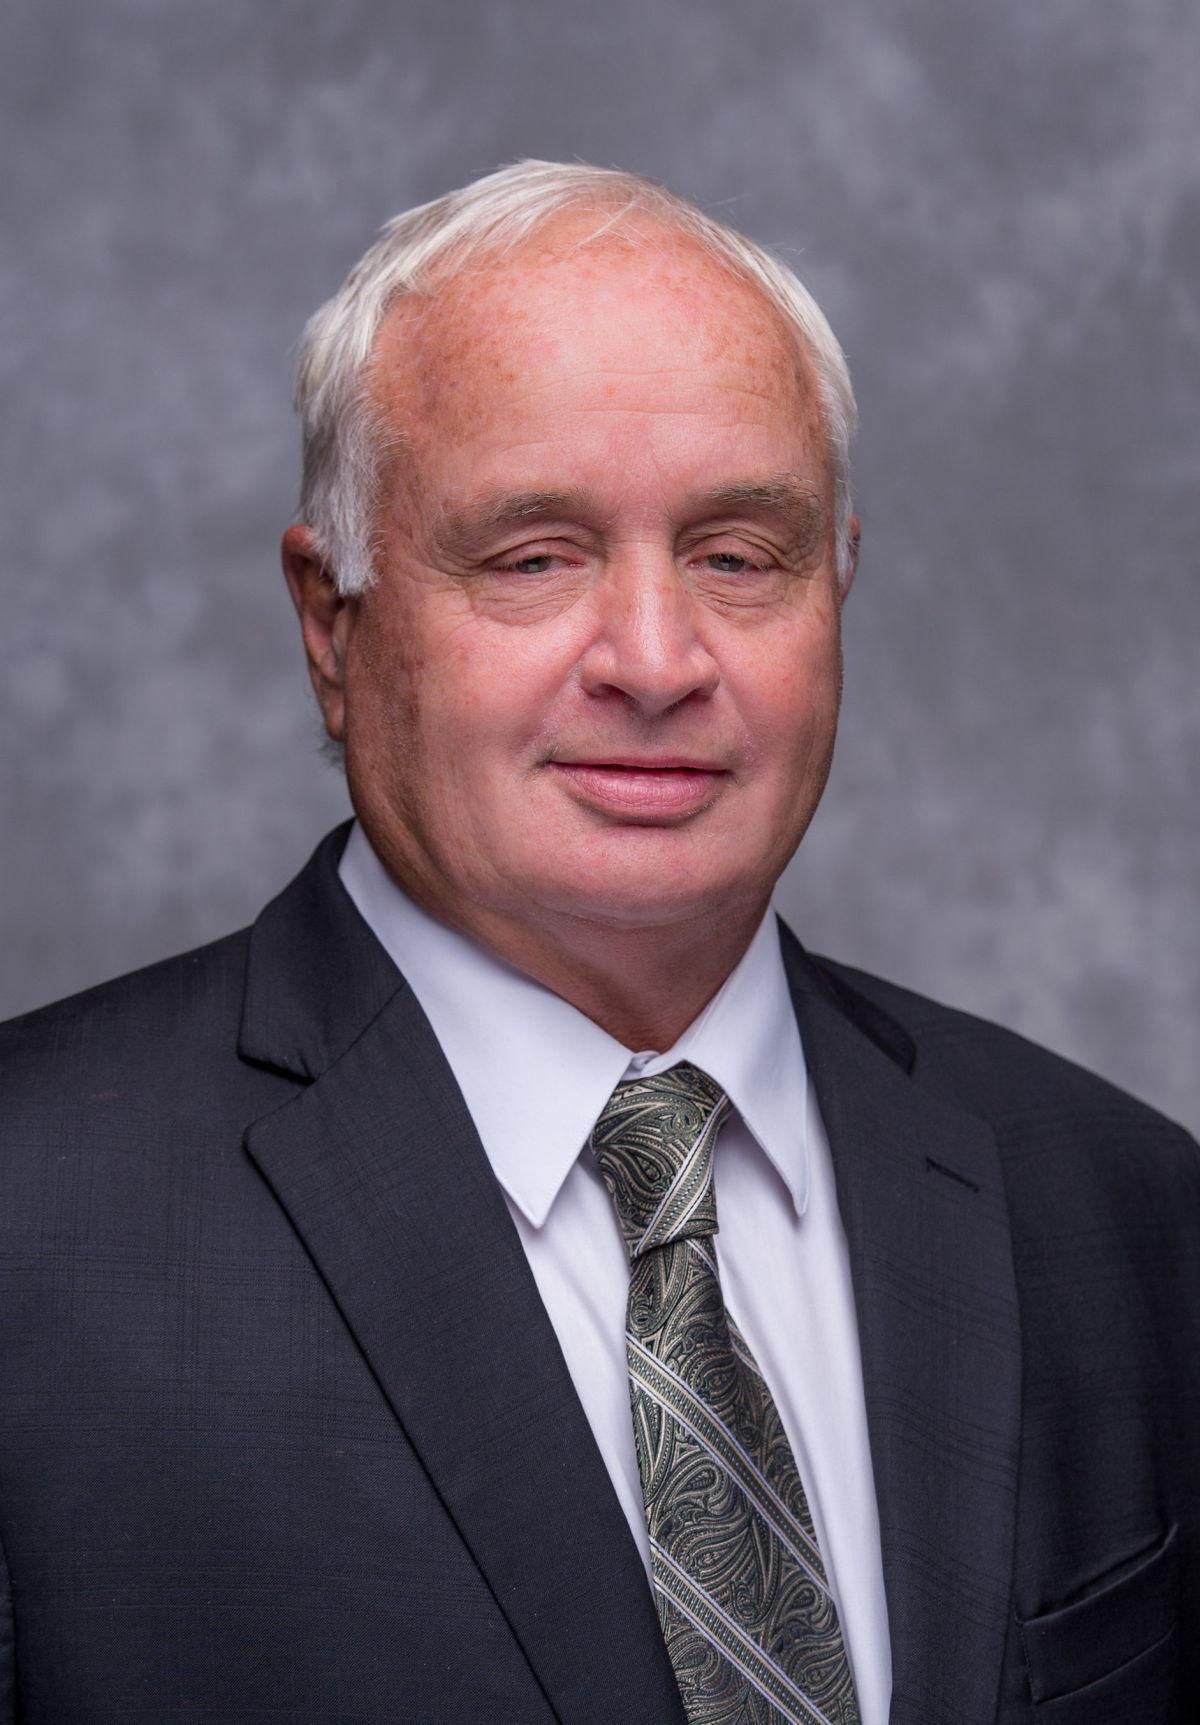 State Sen. Rick Niemeyer, R-Lowell